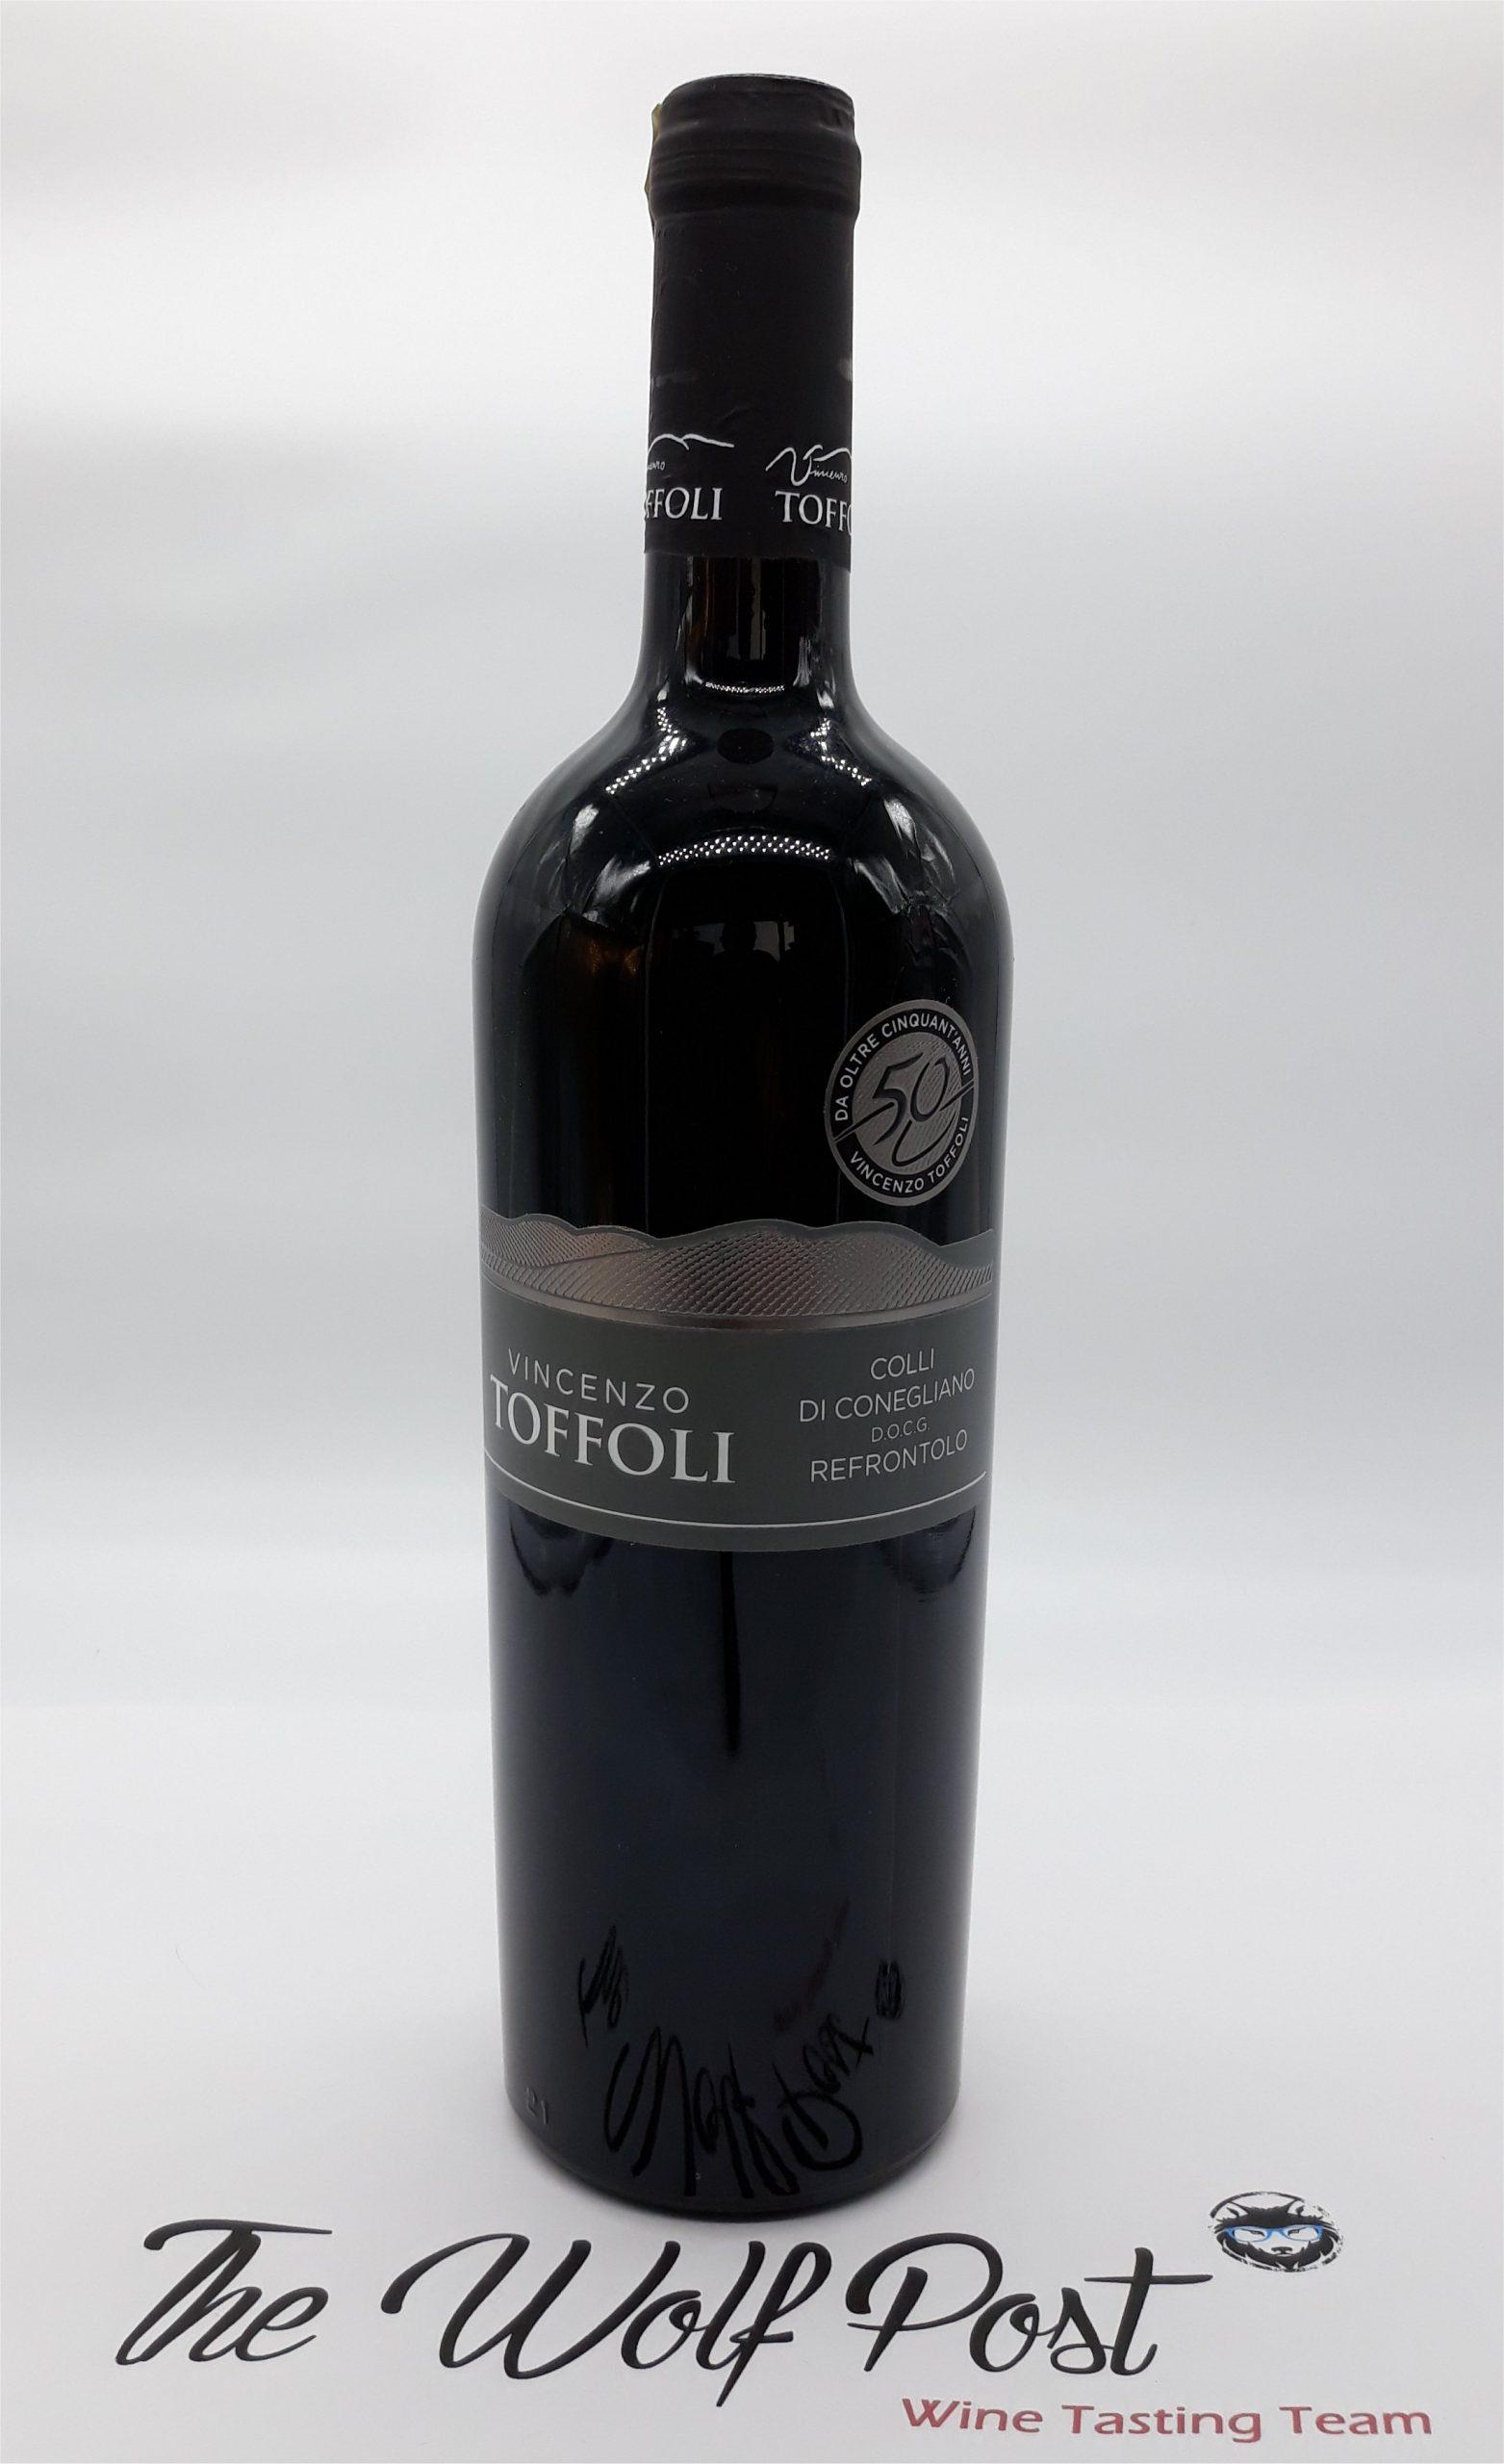 Refrontolo 2016 - Vincenzo Toffoli